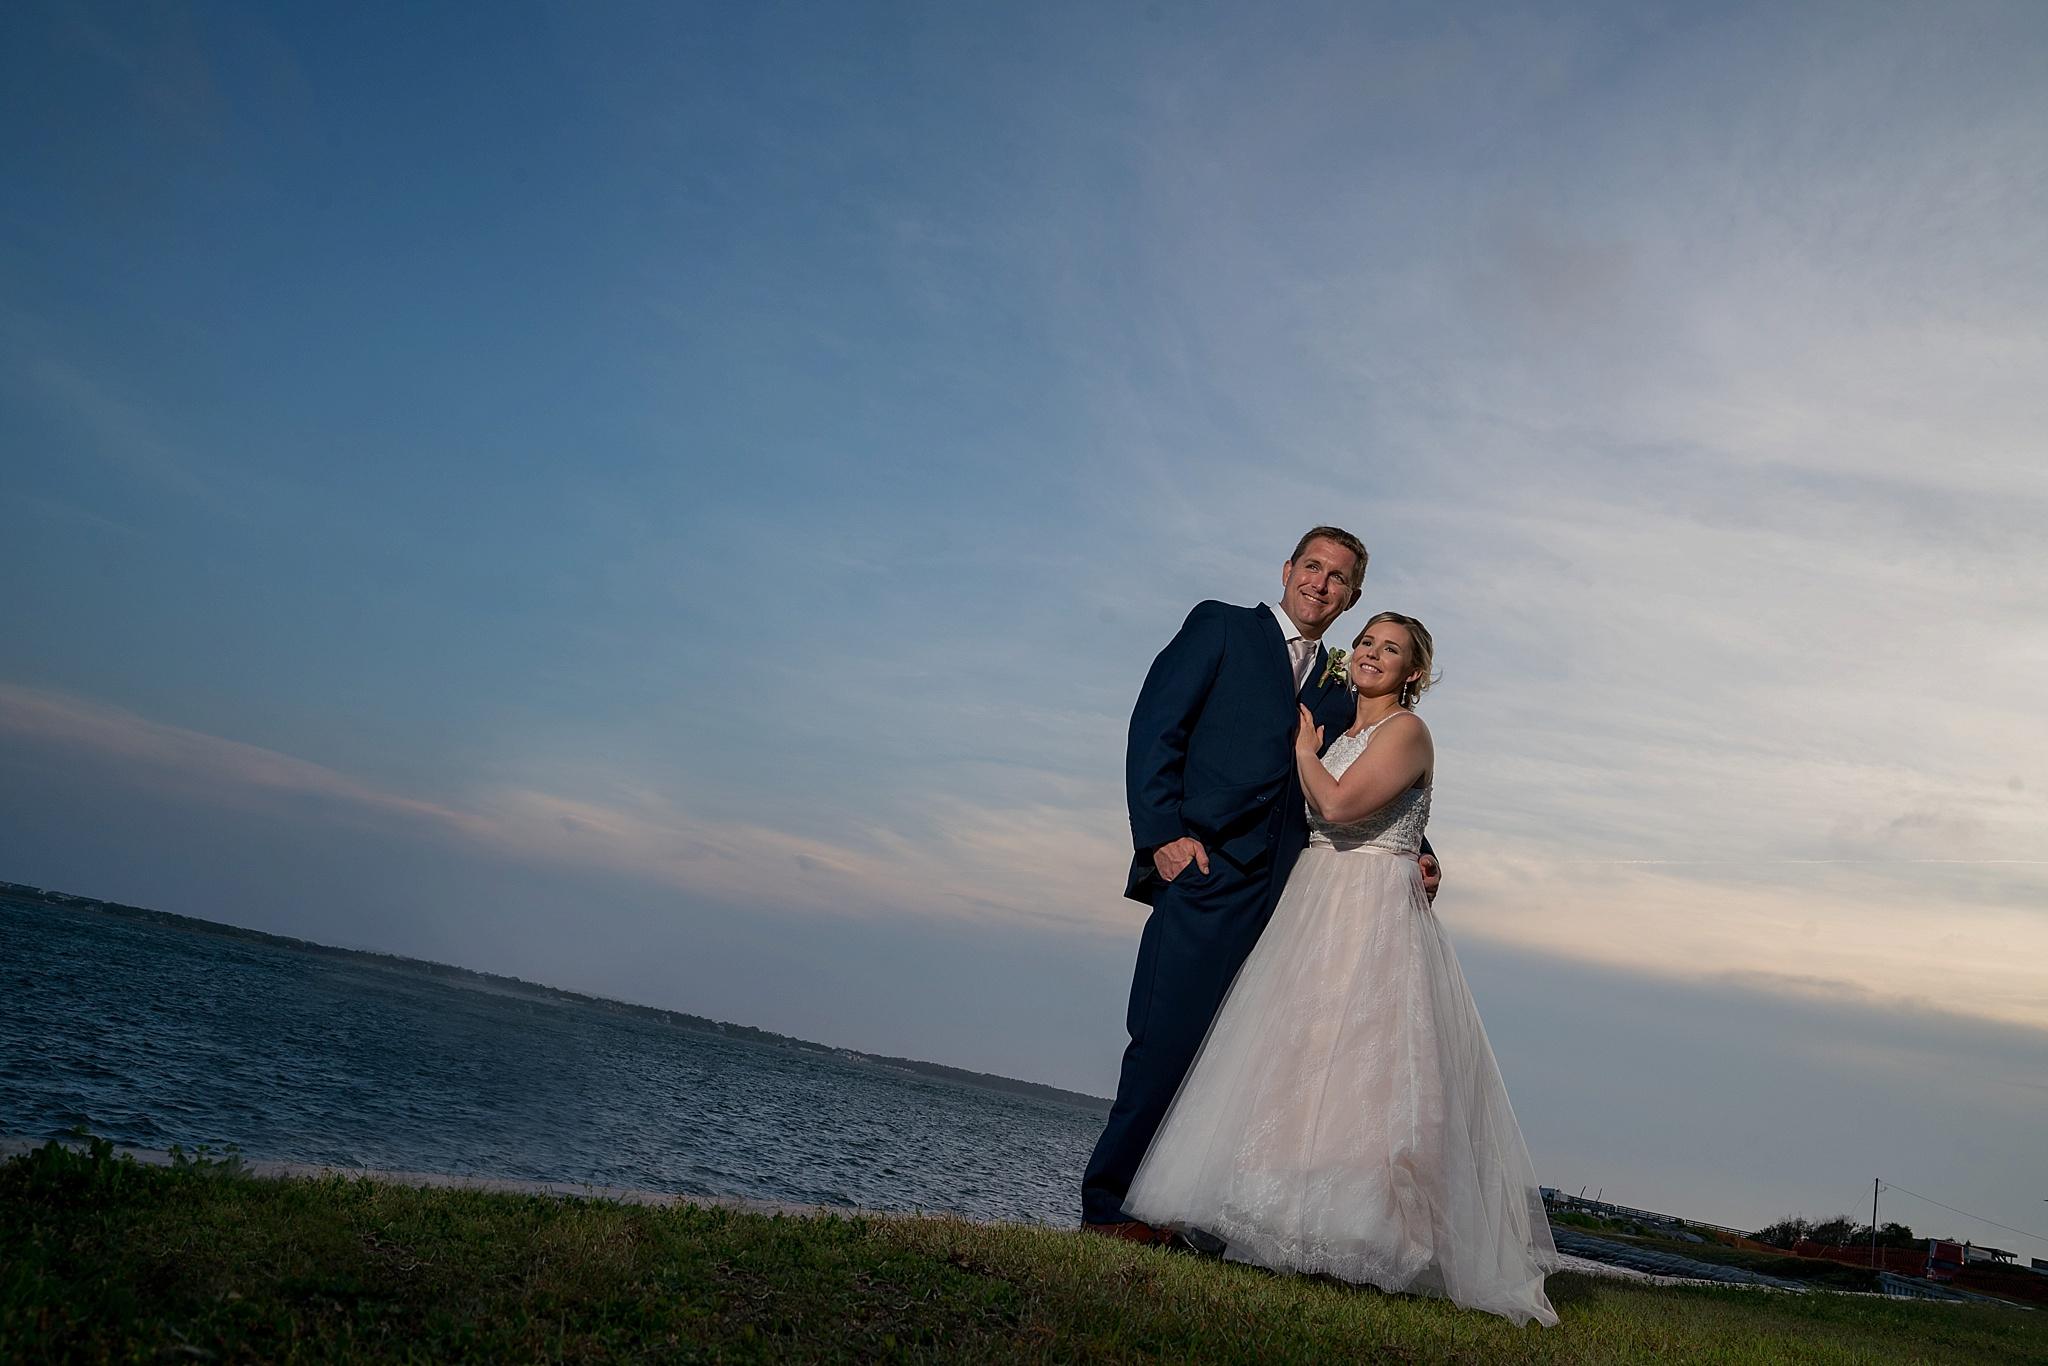 Crystal-Coast-Wedding-Photographer-001.jpg